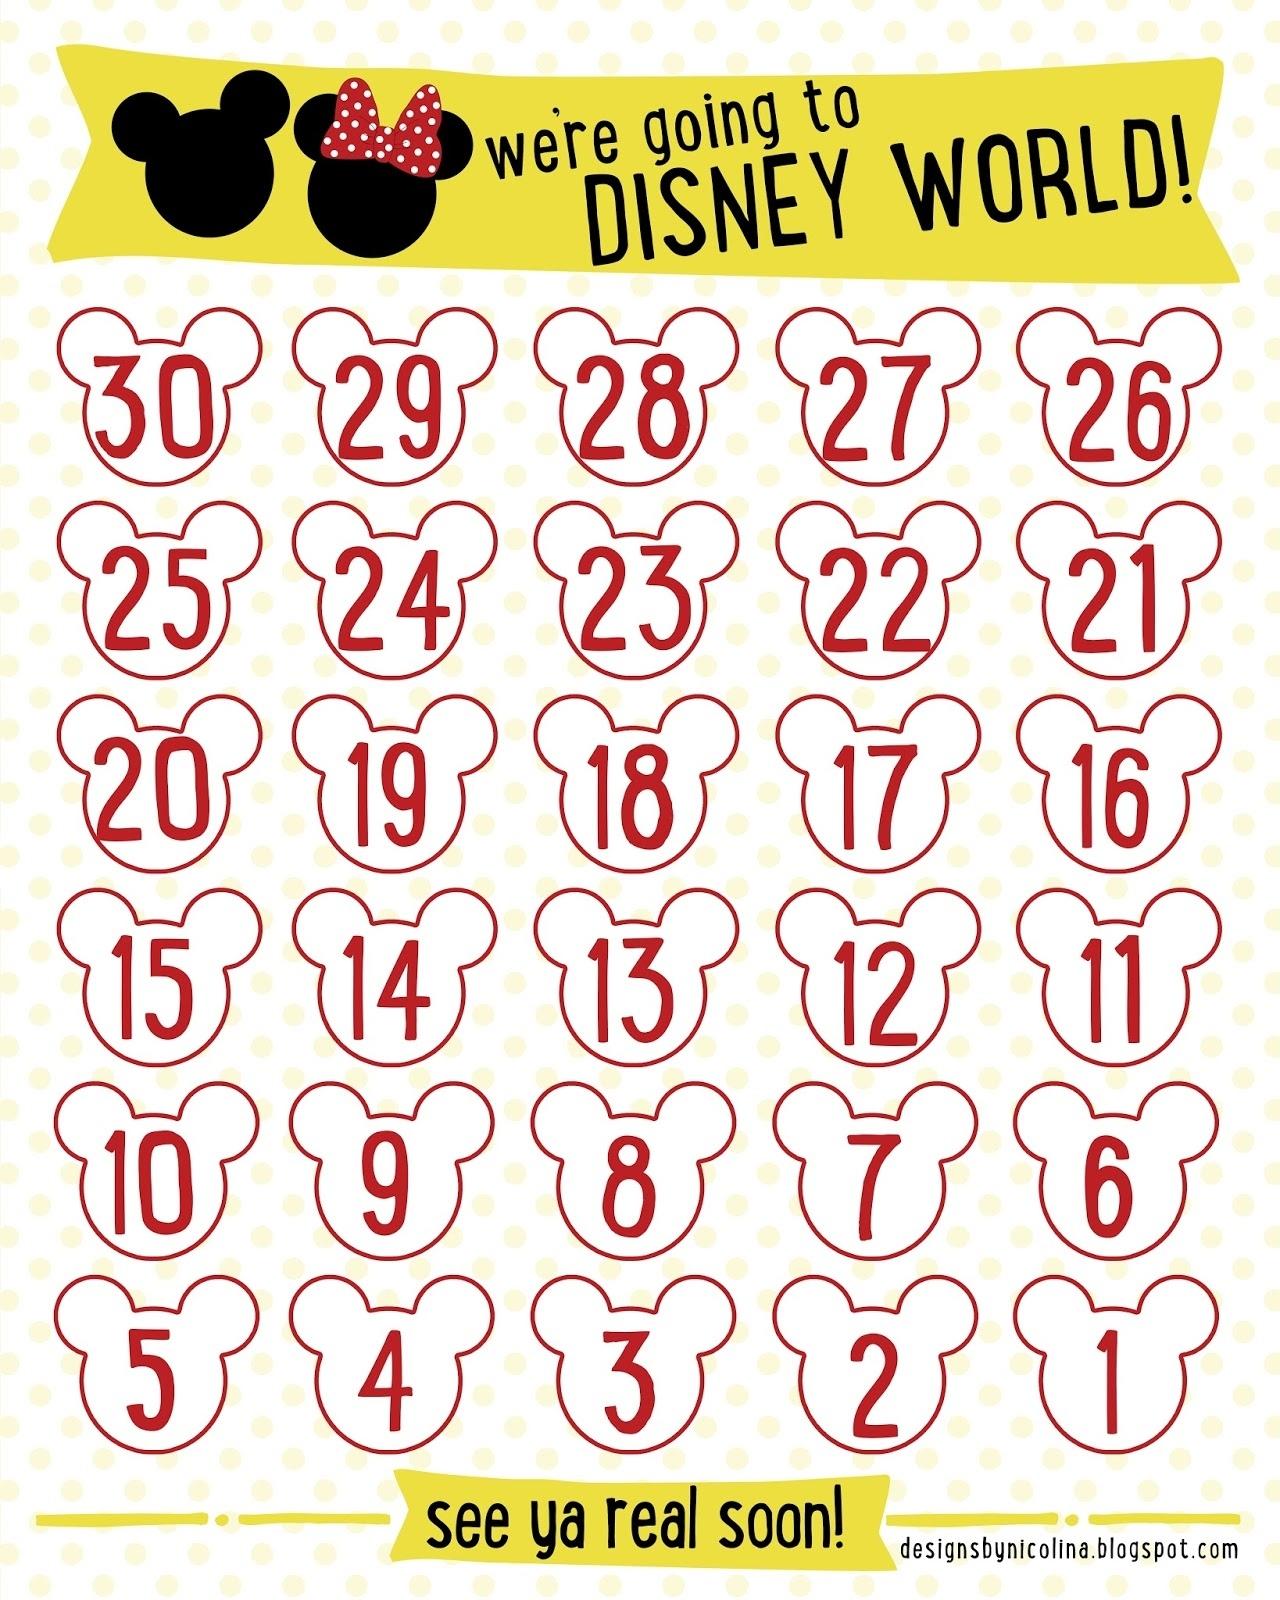 Designs By Nicolina: Disney Countdown! /// Free Printable /// Countdown Calendar Days Printable